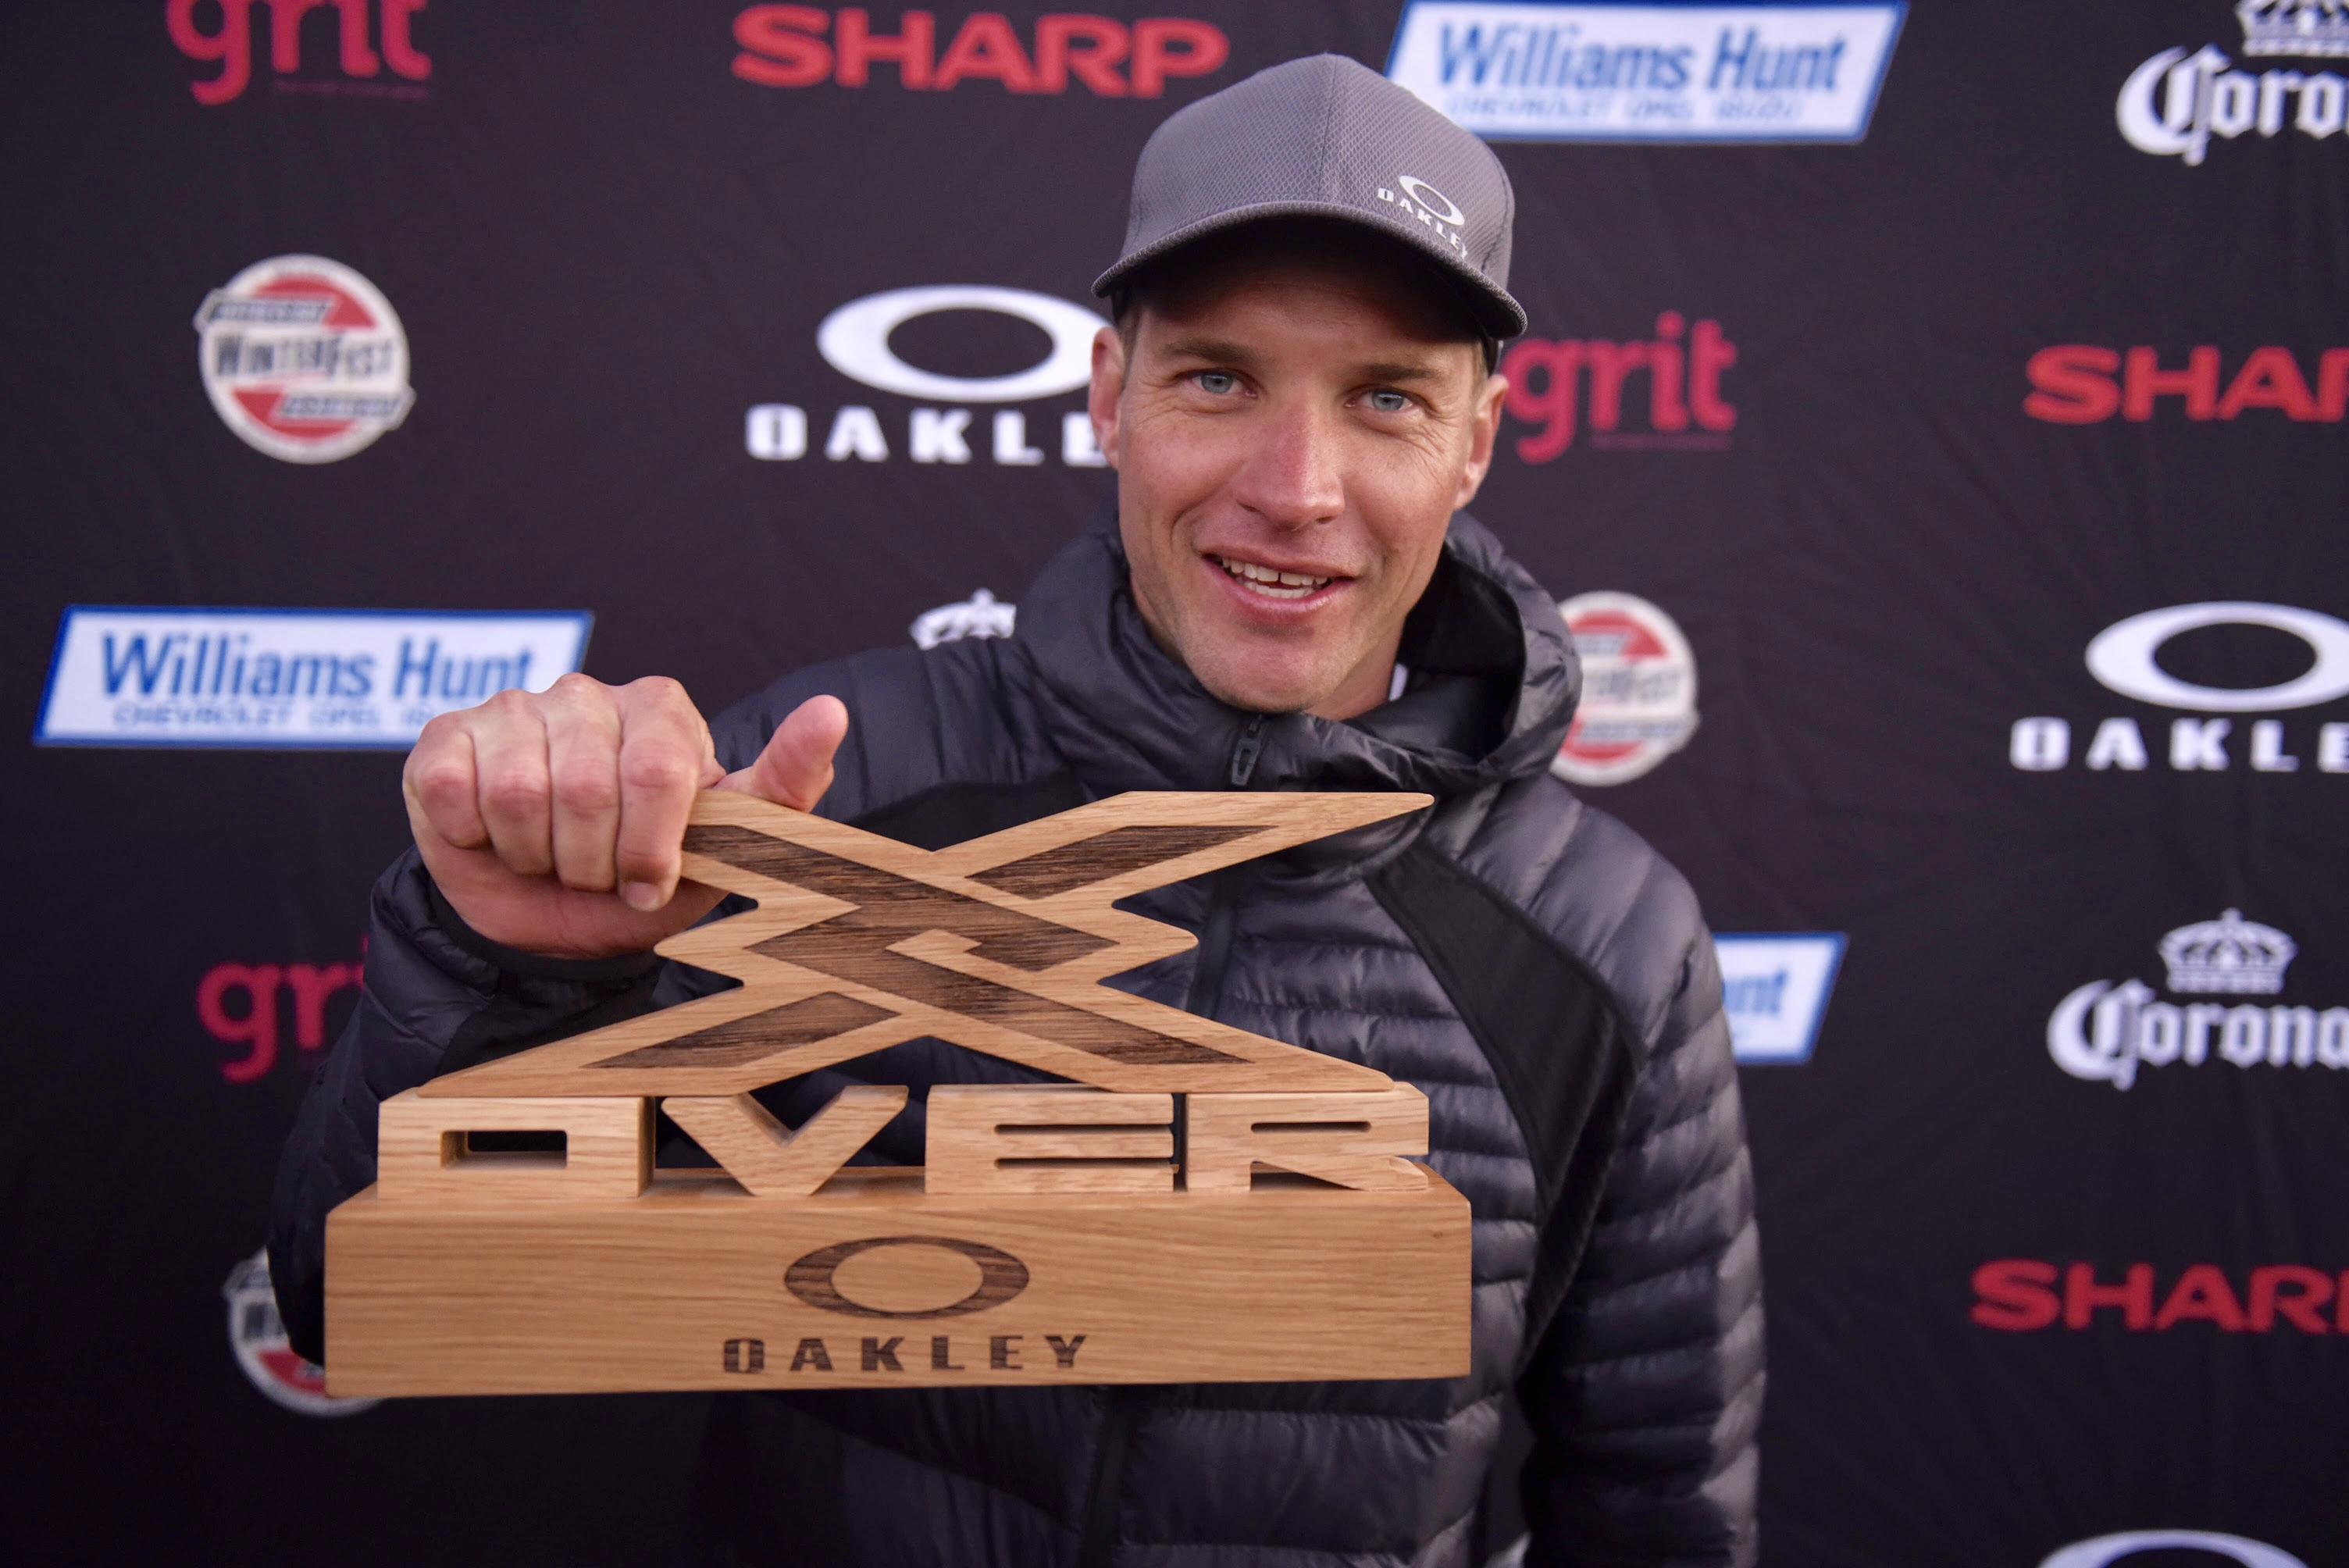 The Oakly X Over Winner Greg Minnaar © Kolesky/Nikon/Lexar